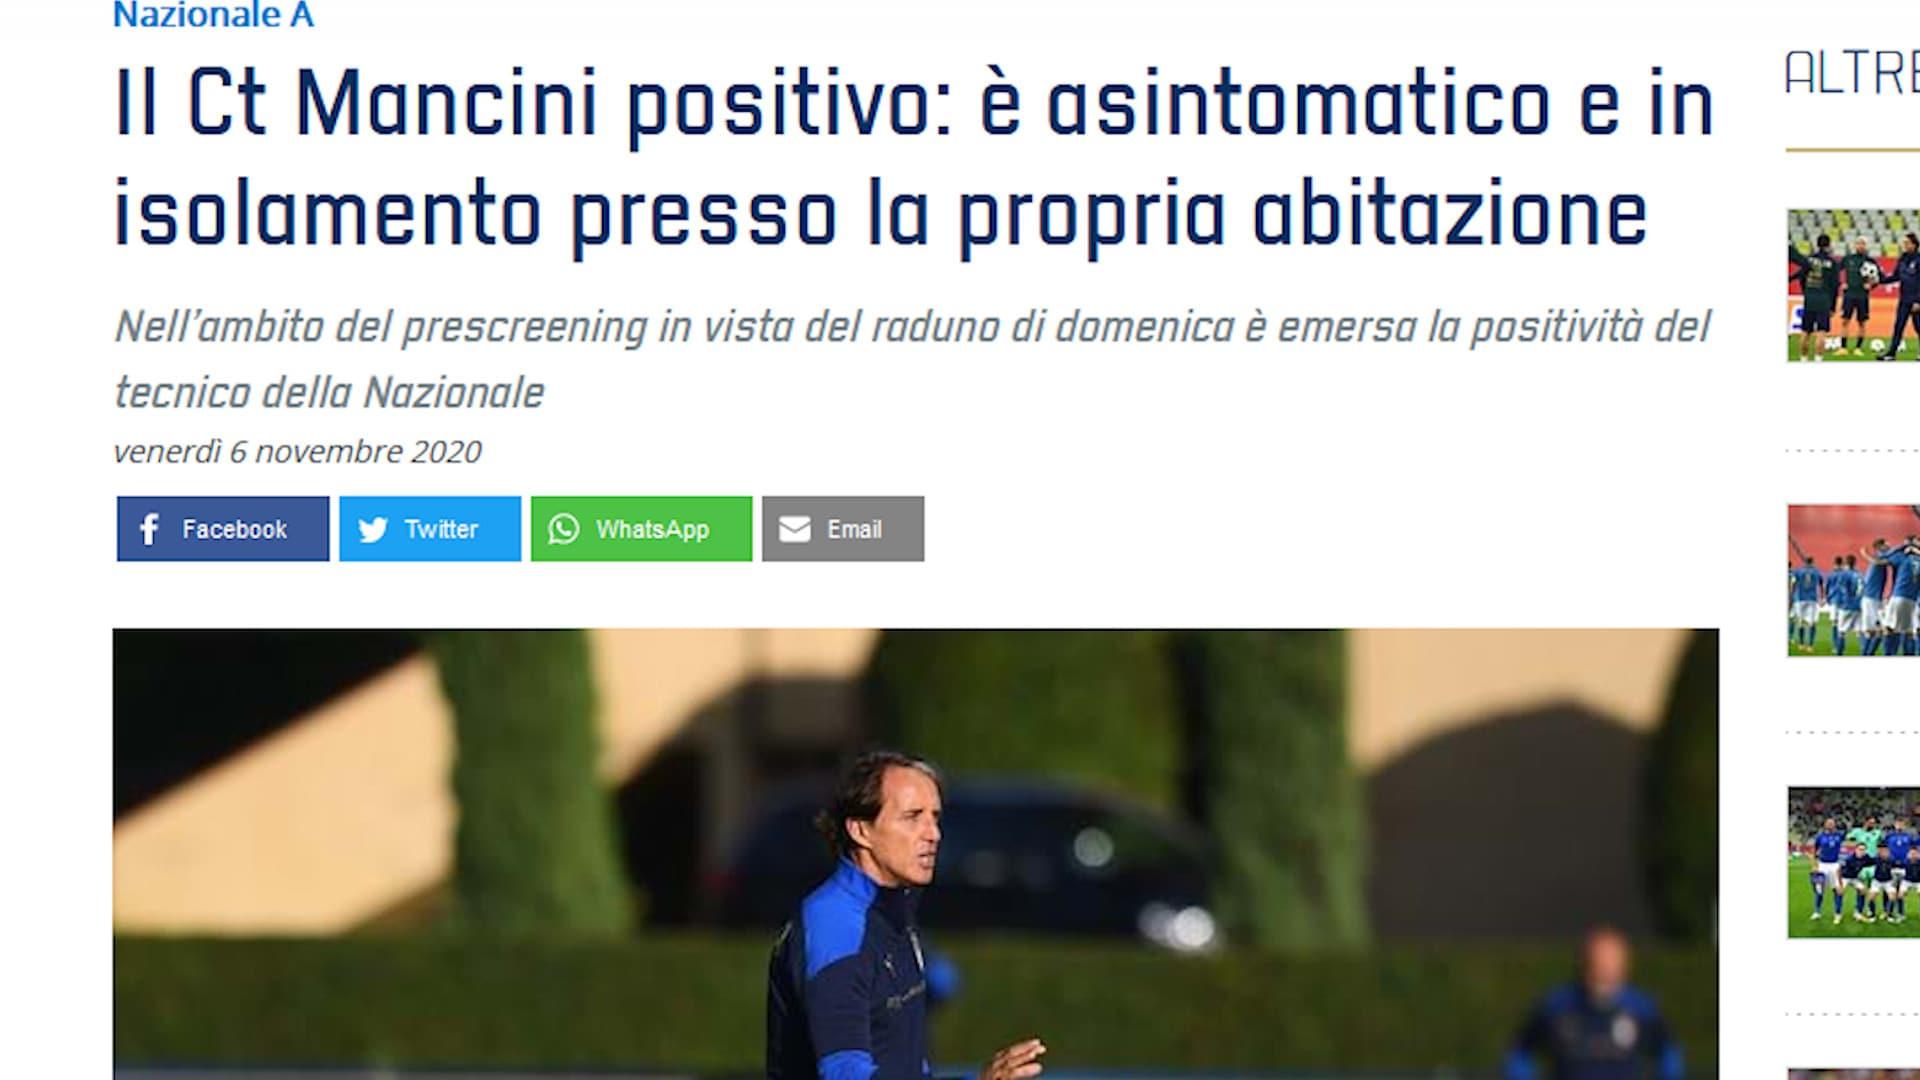 Italia, Roberto Mancini positivo al Coronavirus